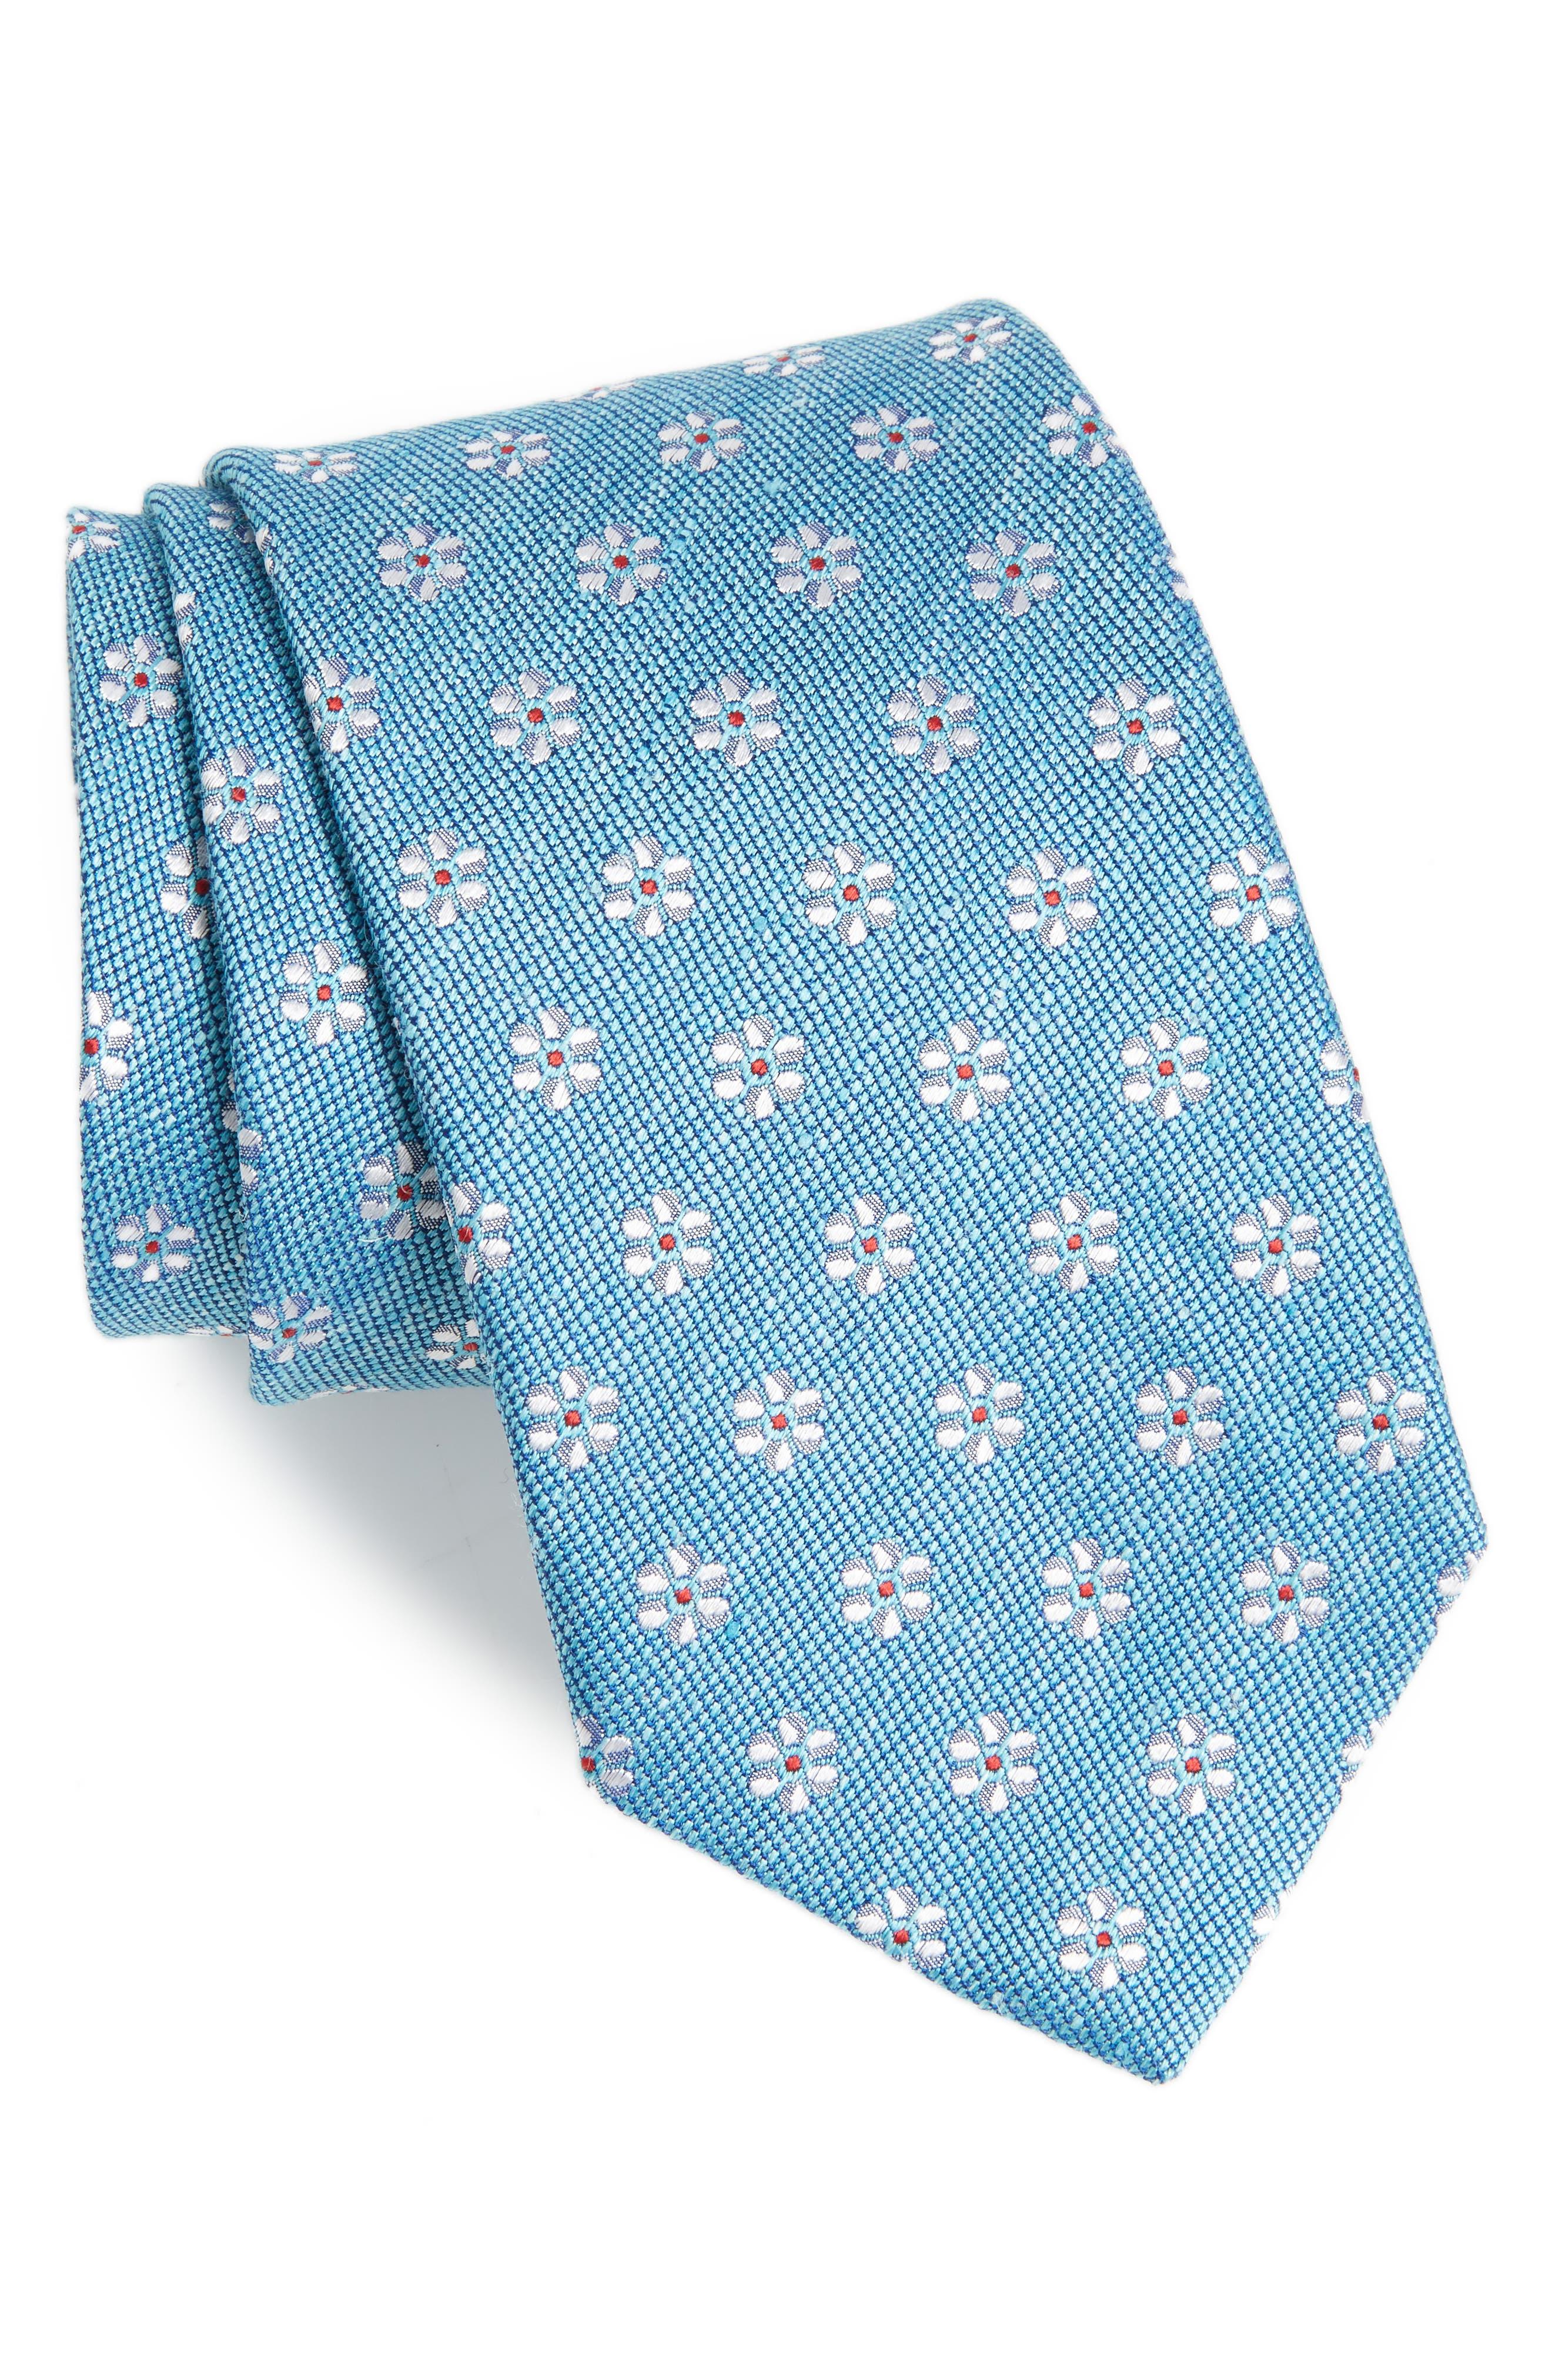 Neat Flower Silk & Linen Tie,                             Main thumbnail 1, color,                             400